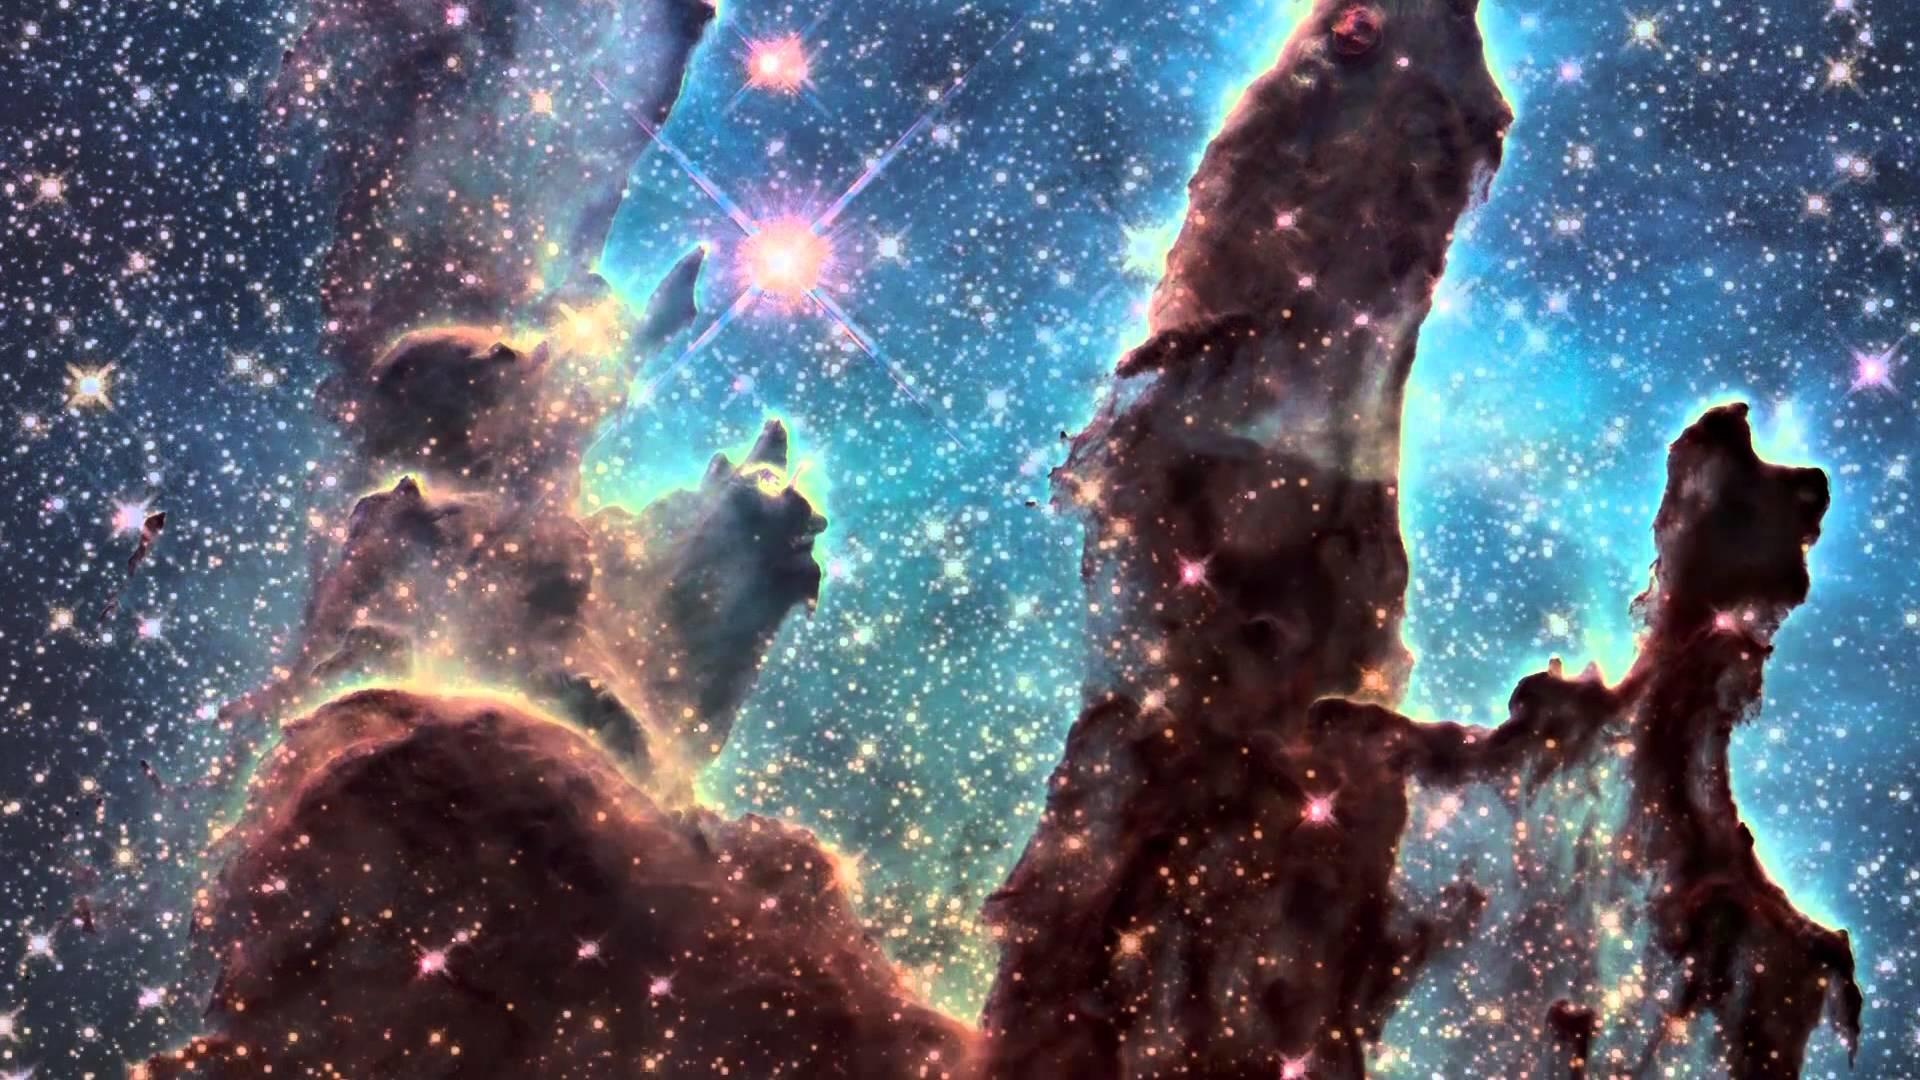 11 best Psynce.com images on Pinterest   Black holes, Universe and Fringes